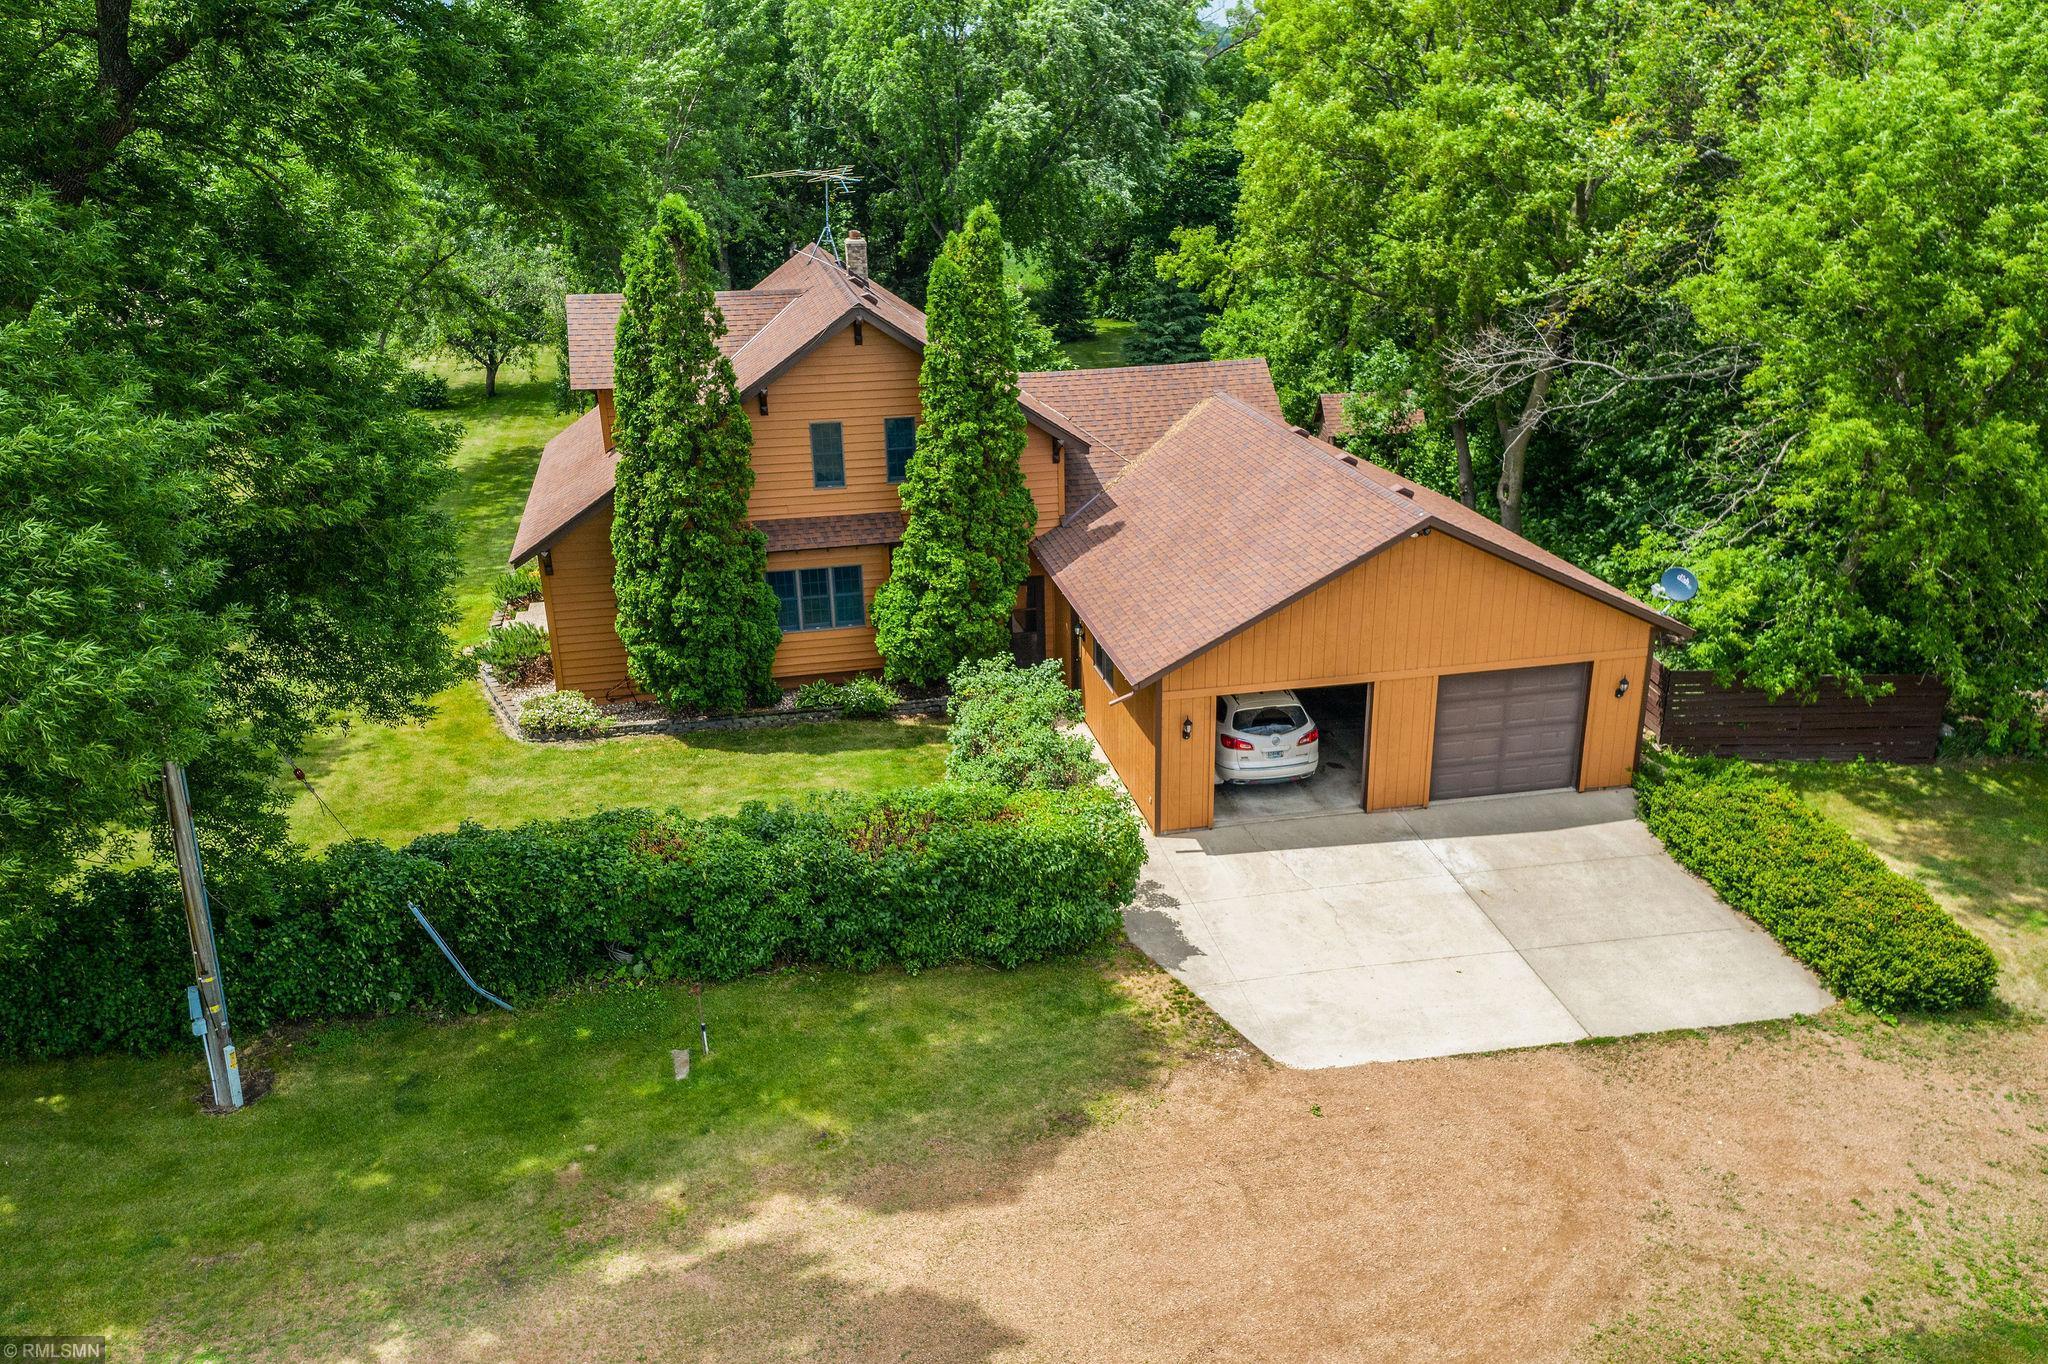 7132 207th Property Photo - Silver Lake, MN real estate listing